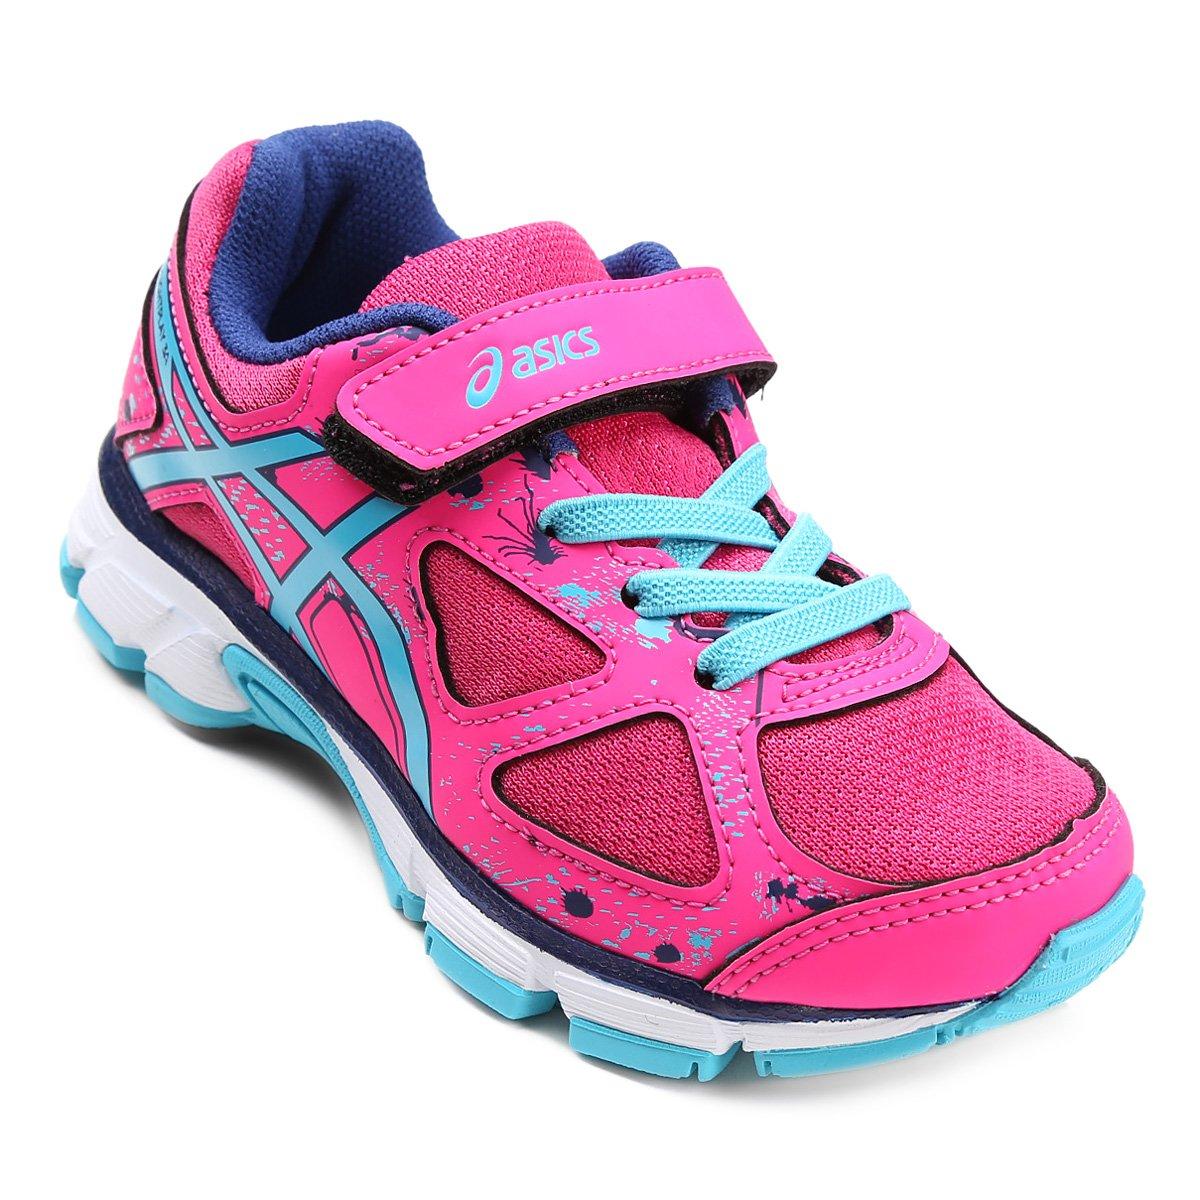 f6d781c1ed7 Tênis Infantil Asics Gel Lightplay 3 A - Pink e Azul - Compre Agora ...